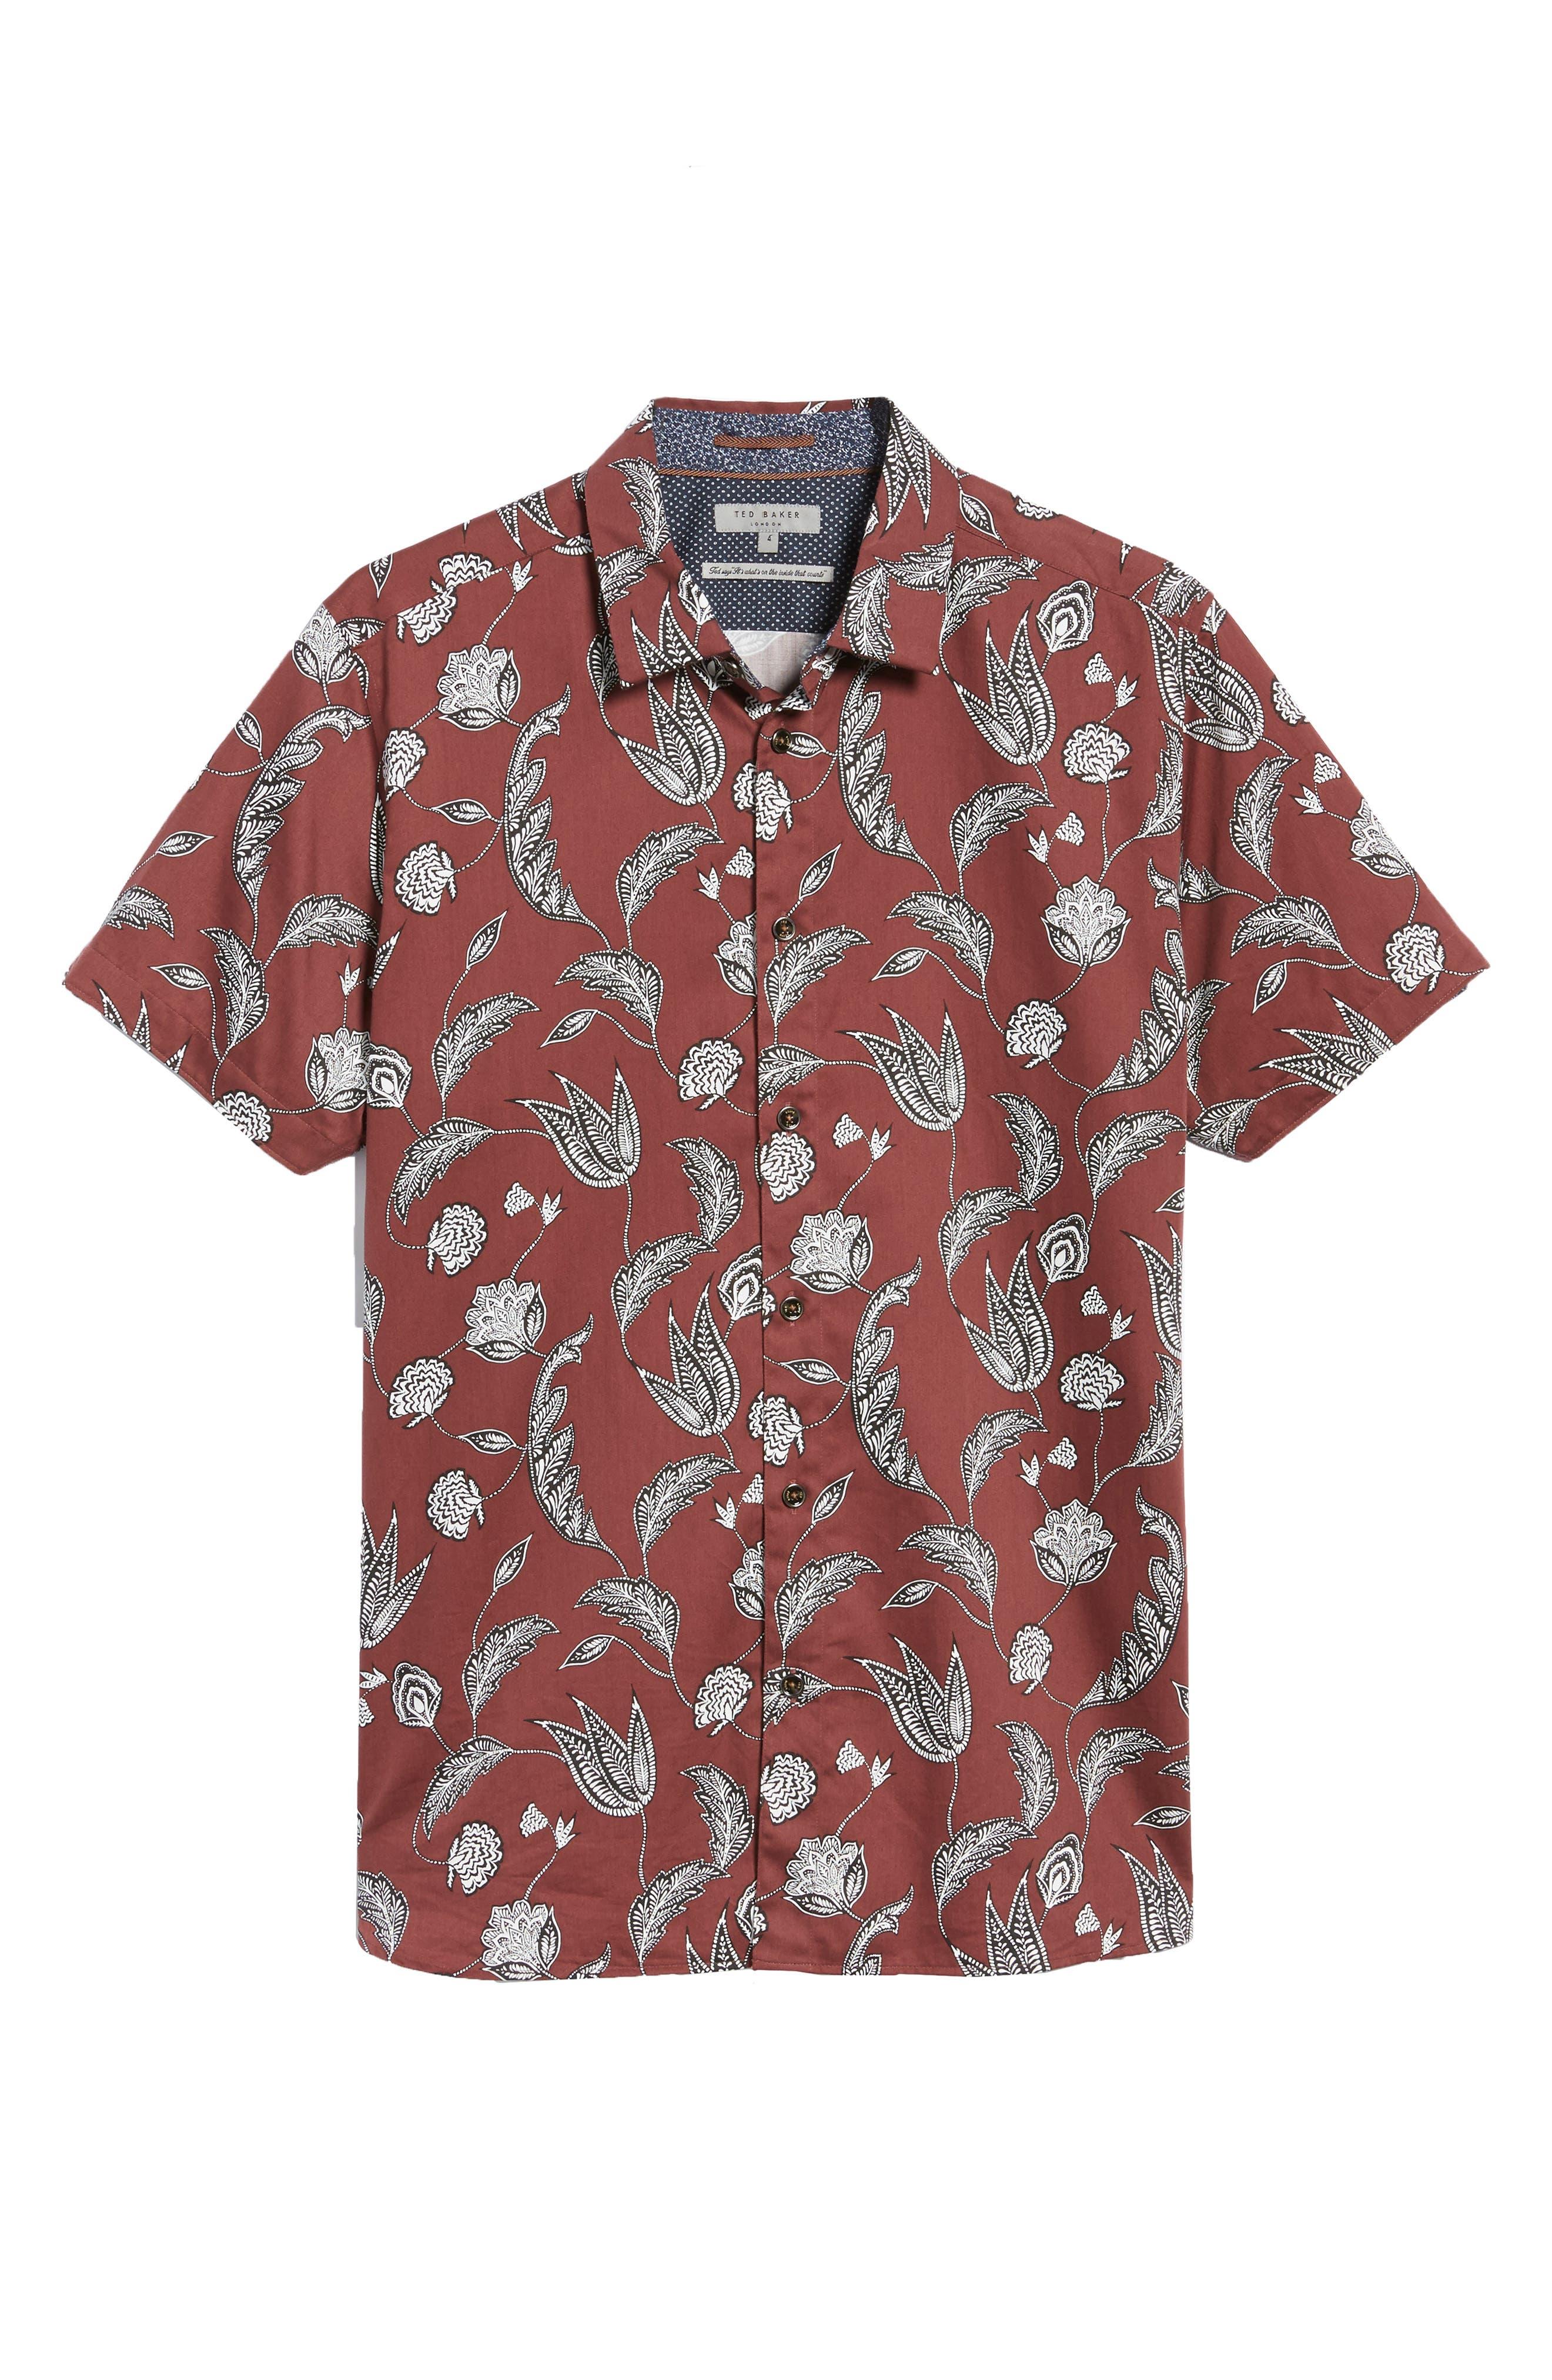 UTKU Floral Sport Shirt,                             Alternate thumbnail 12, color,